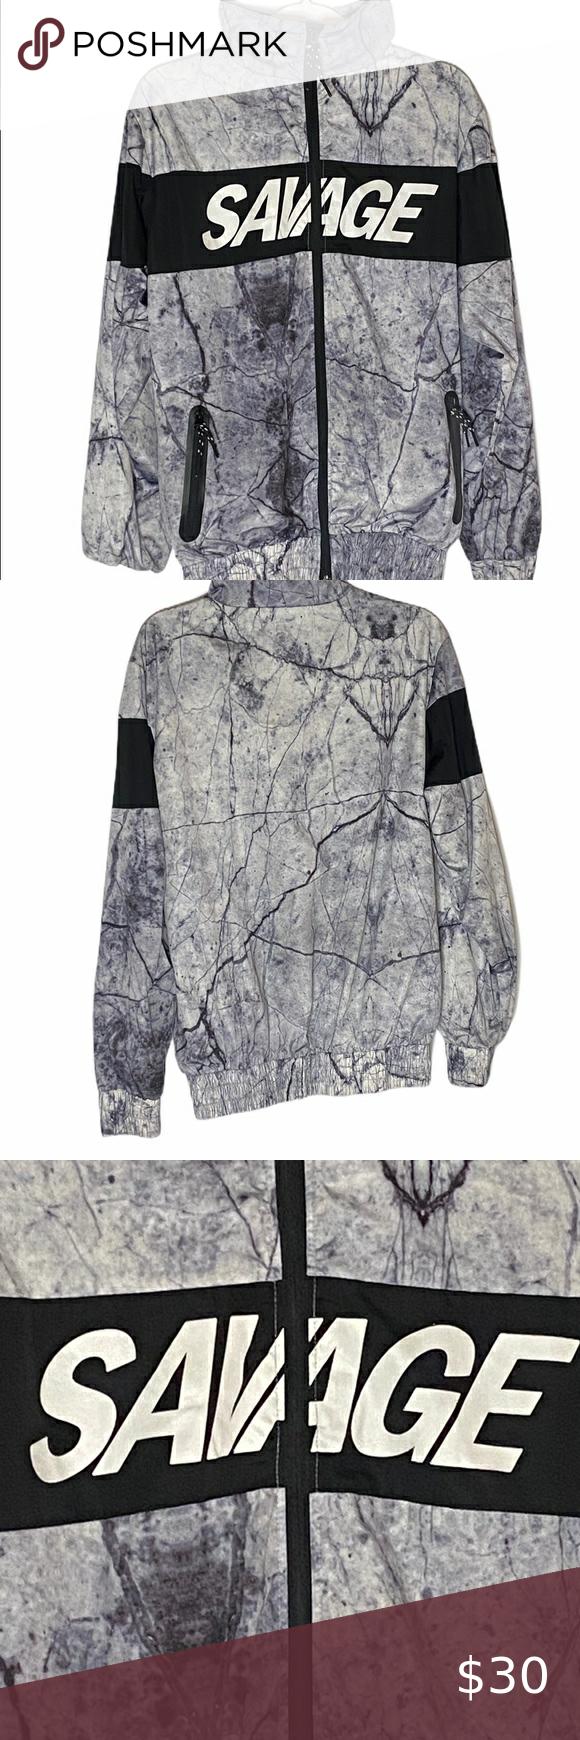 Hudson Outerwear Gray Black Marble Savage Jacket Outerwear Jackets Outerwear Jackets [ 1740 x 580 Pixel ]